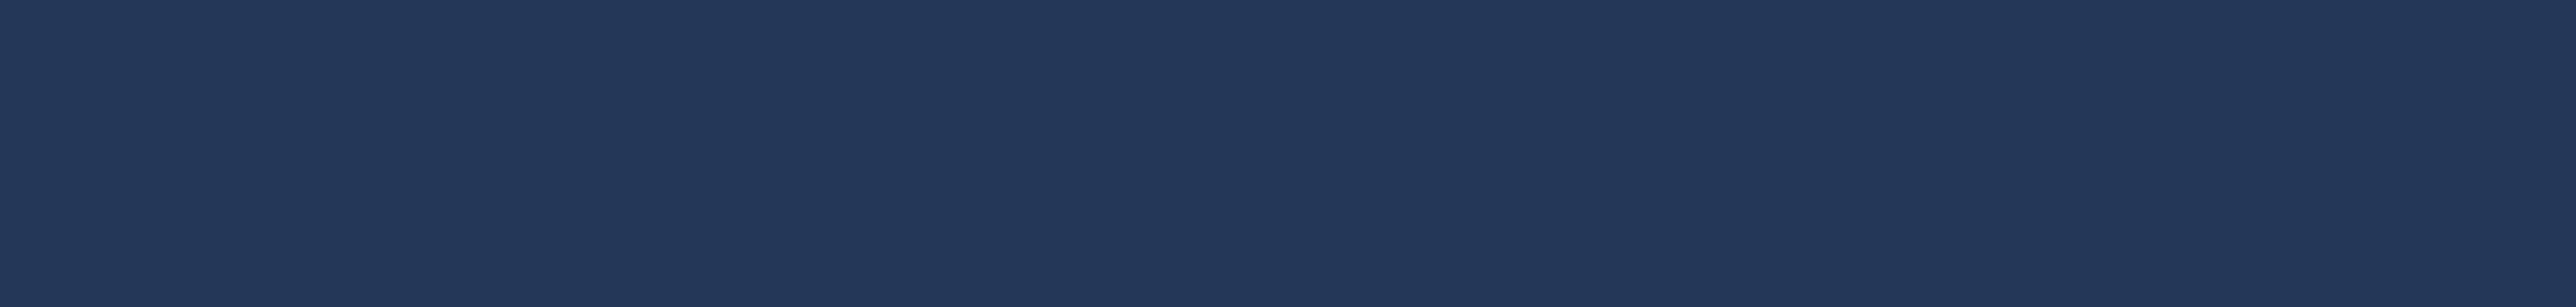 AppDynamics-Logo